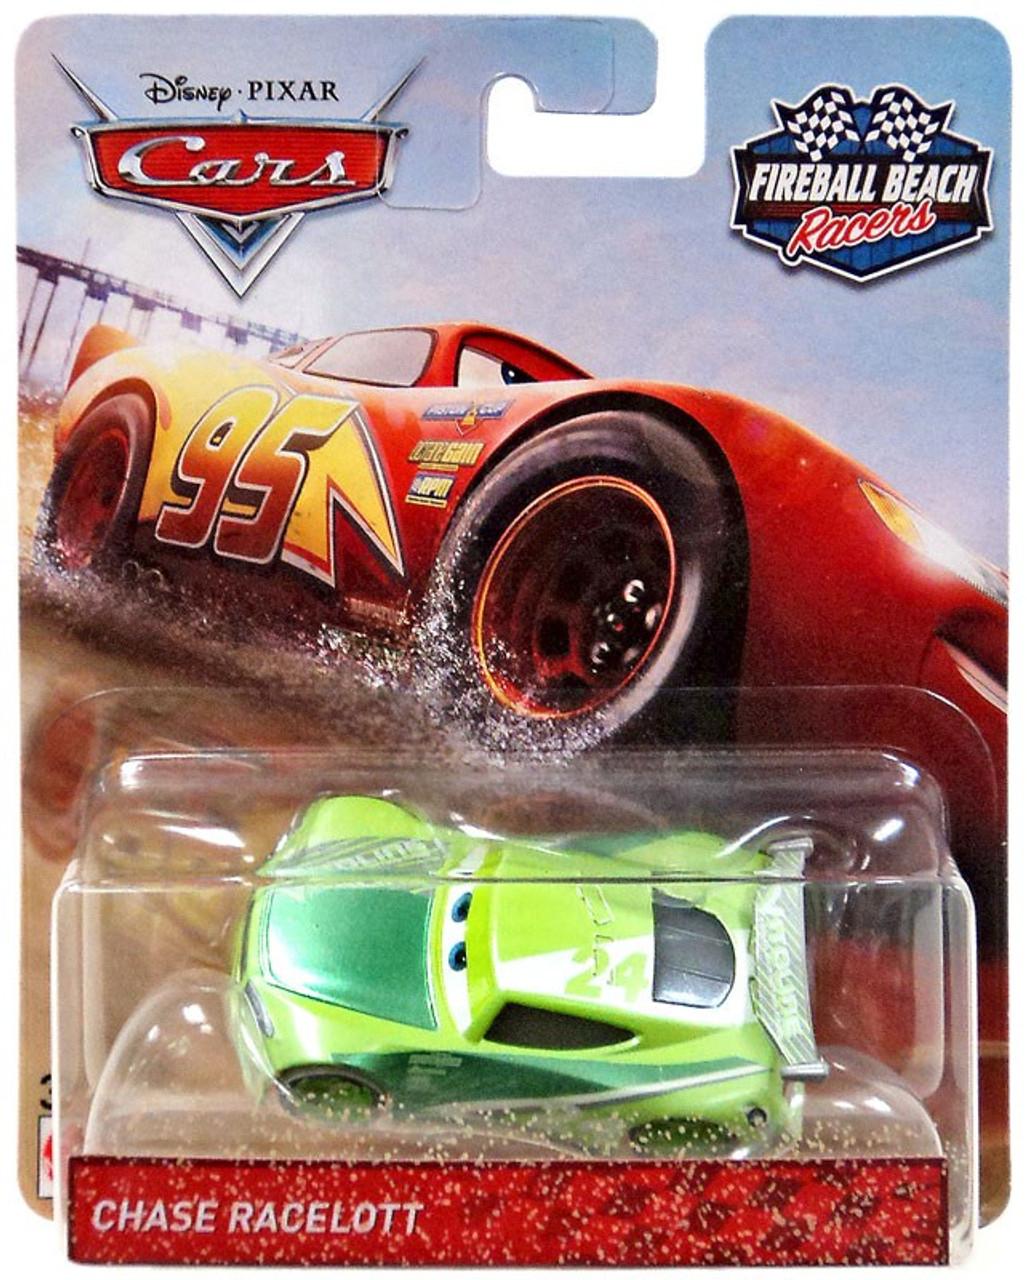 Disney Pixar Cars Cars 3 Fireball Beach Racers Chase